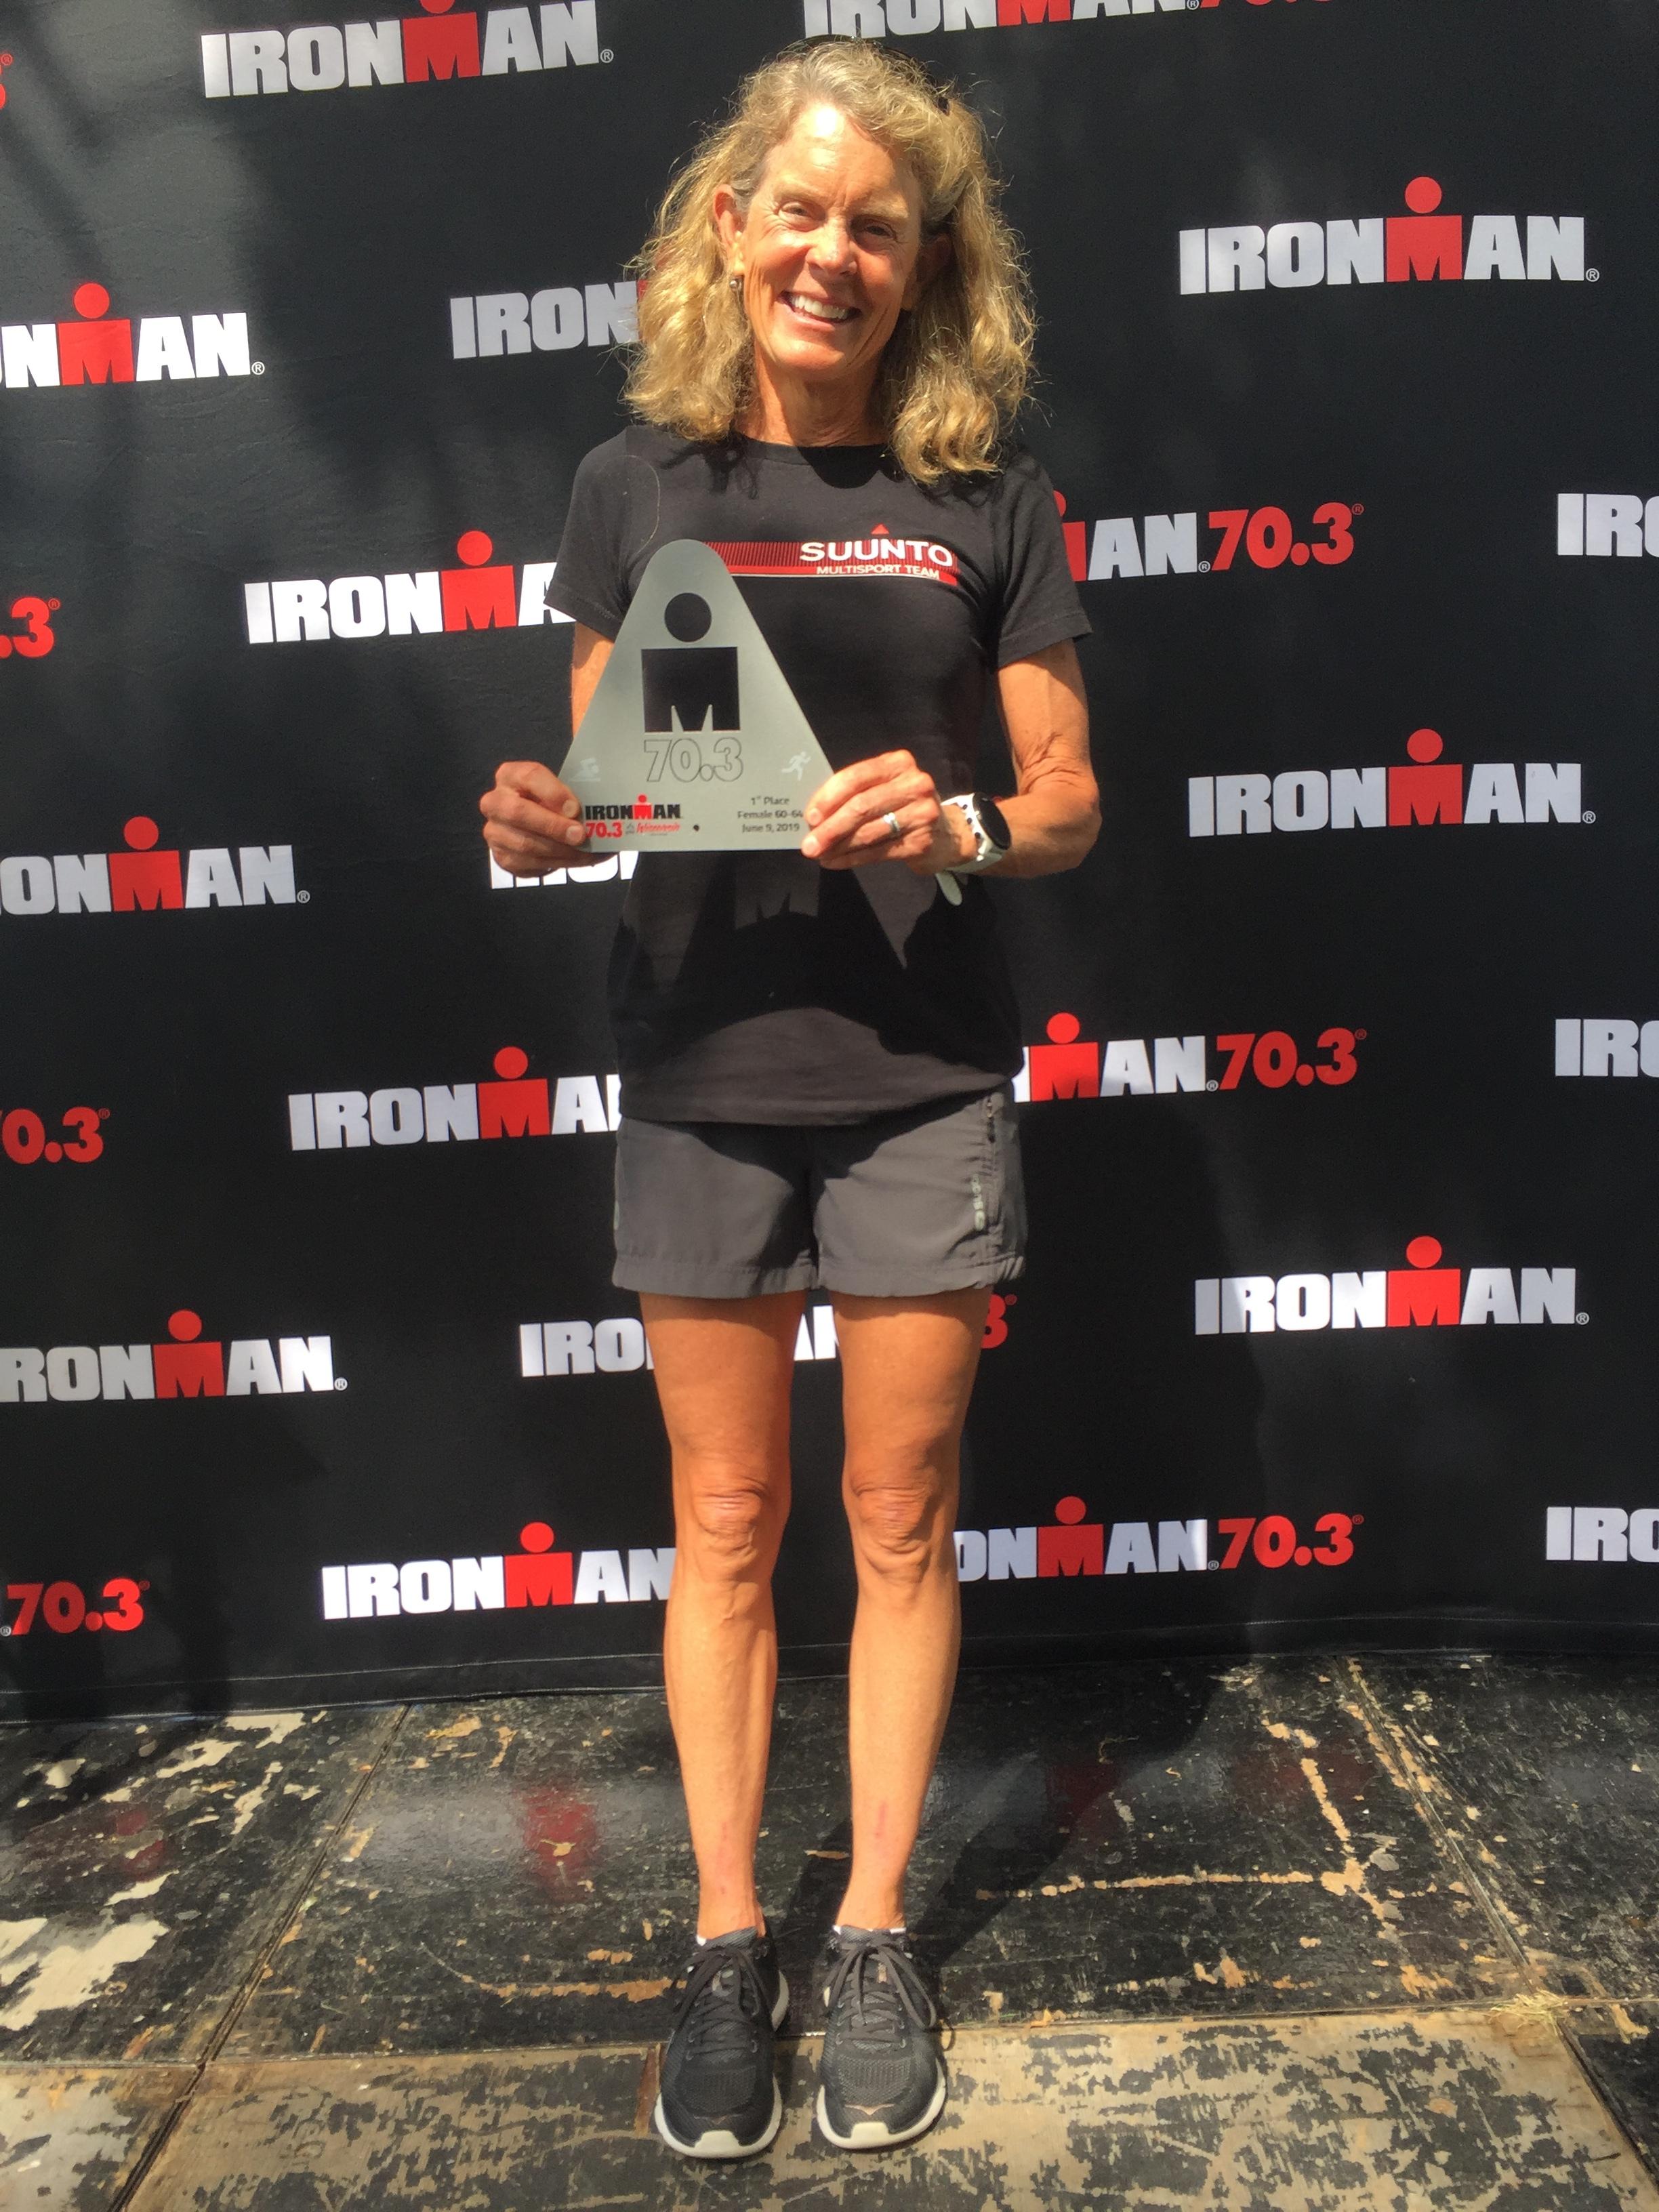 Ellen Hart back to doing what she loves best - racing